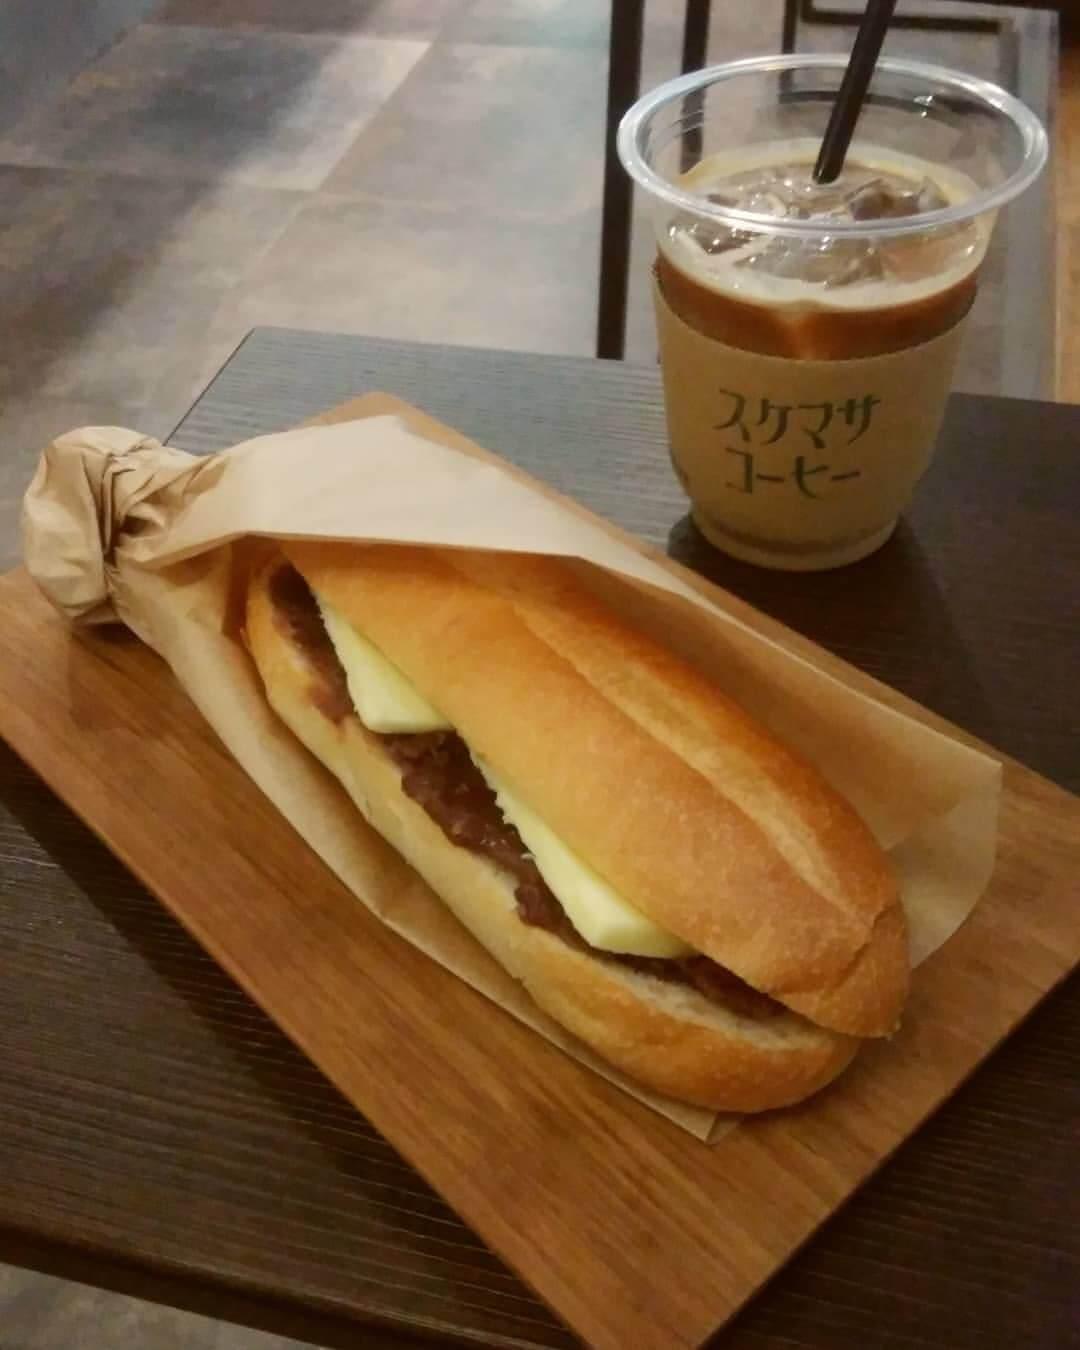 %e6%b5%85%e8%8d%89-%e6%9c%9d%e3%81%93%e3%82%99%e3%81%af%e3%82%93-%e3%83%a2%e3%83%bc%e3%83%8b%e3%83%b3%e3%82%af%e3%82%99-asakusa-morning-menu-breakfast-2